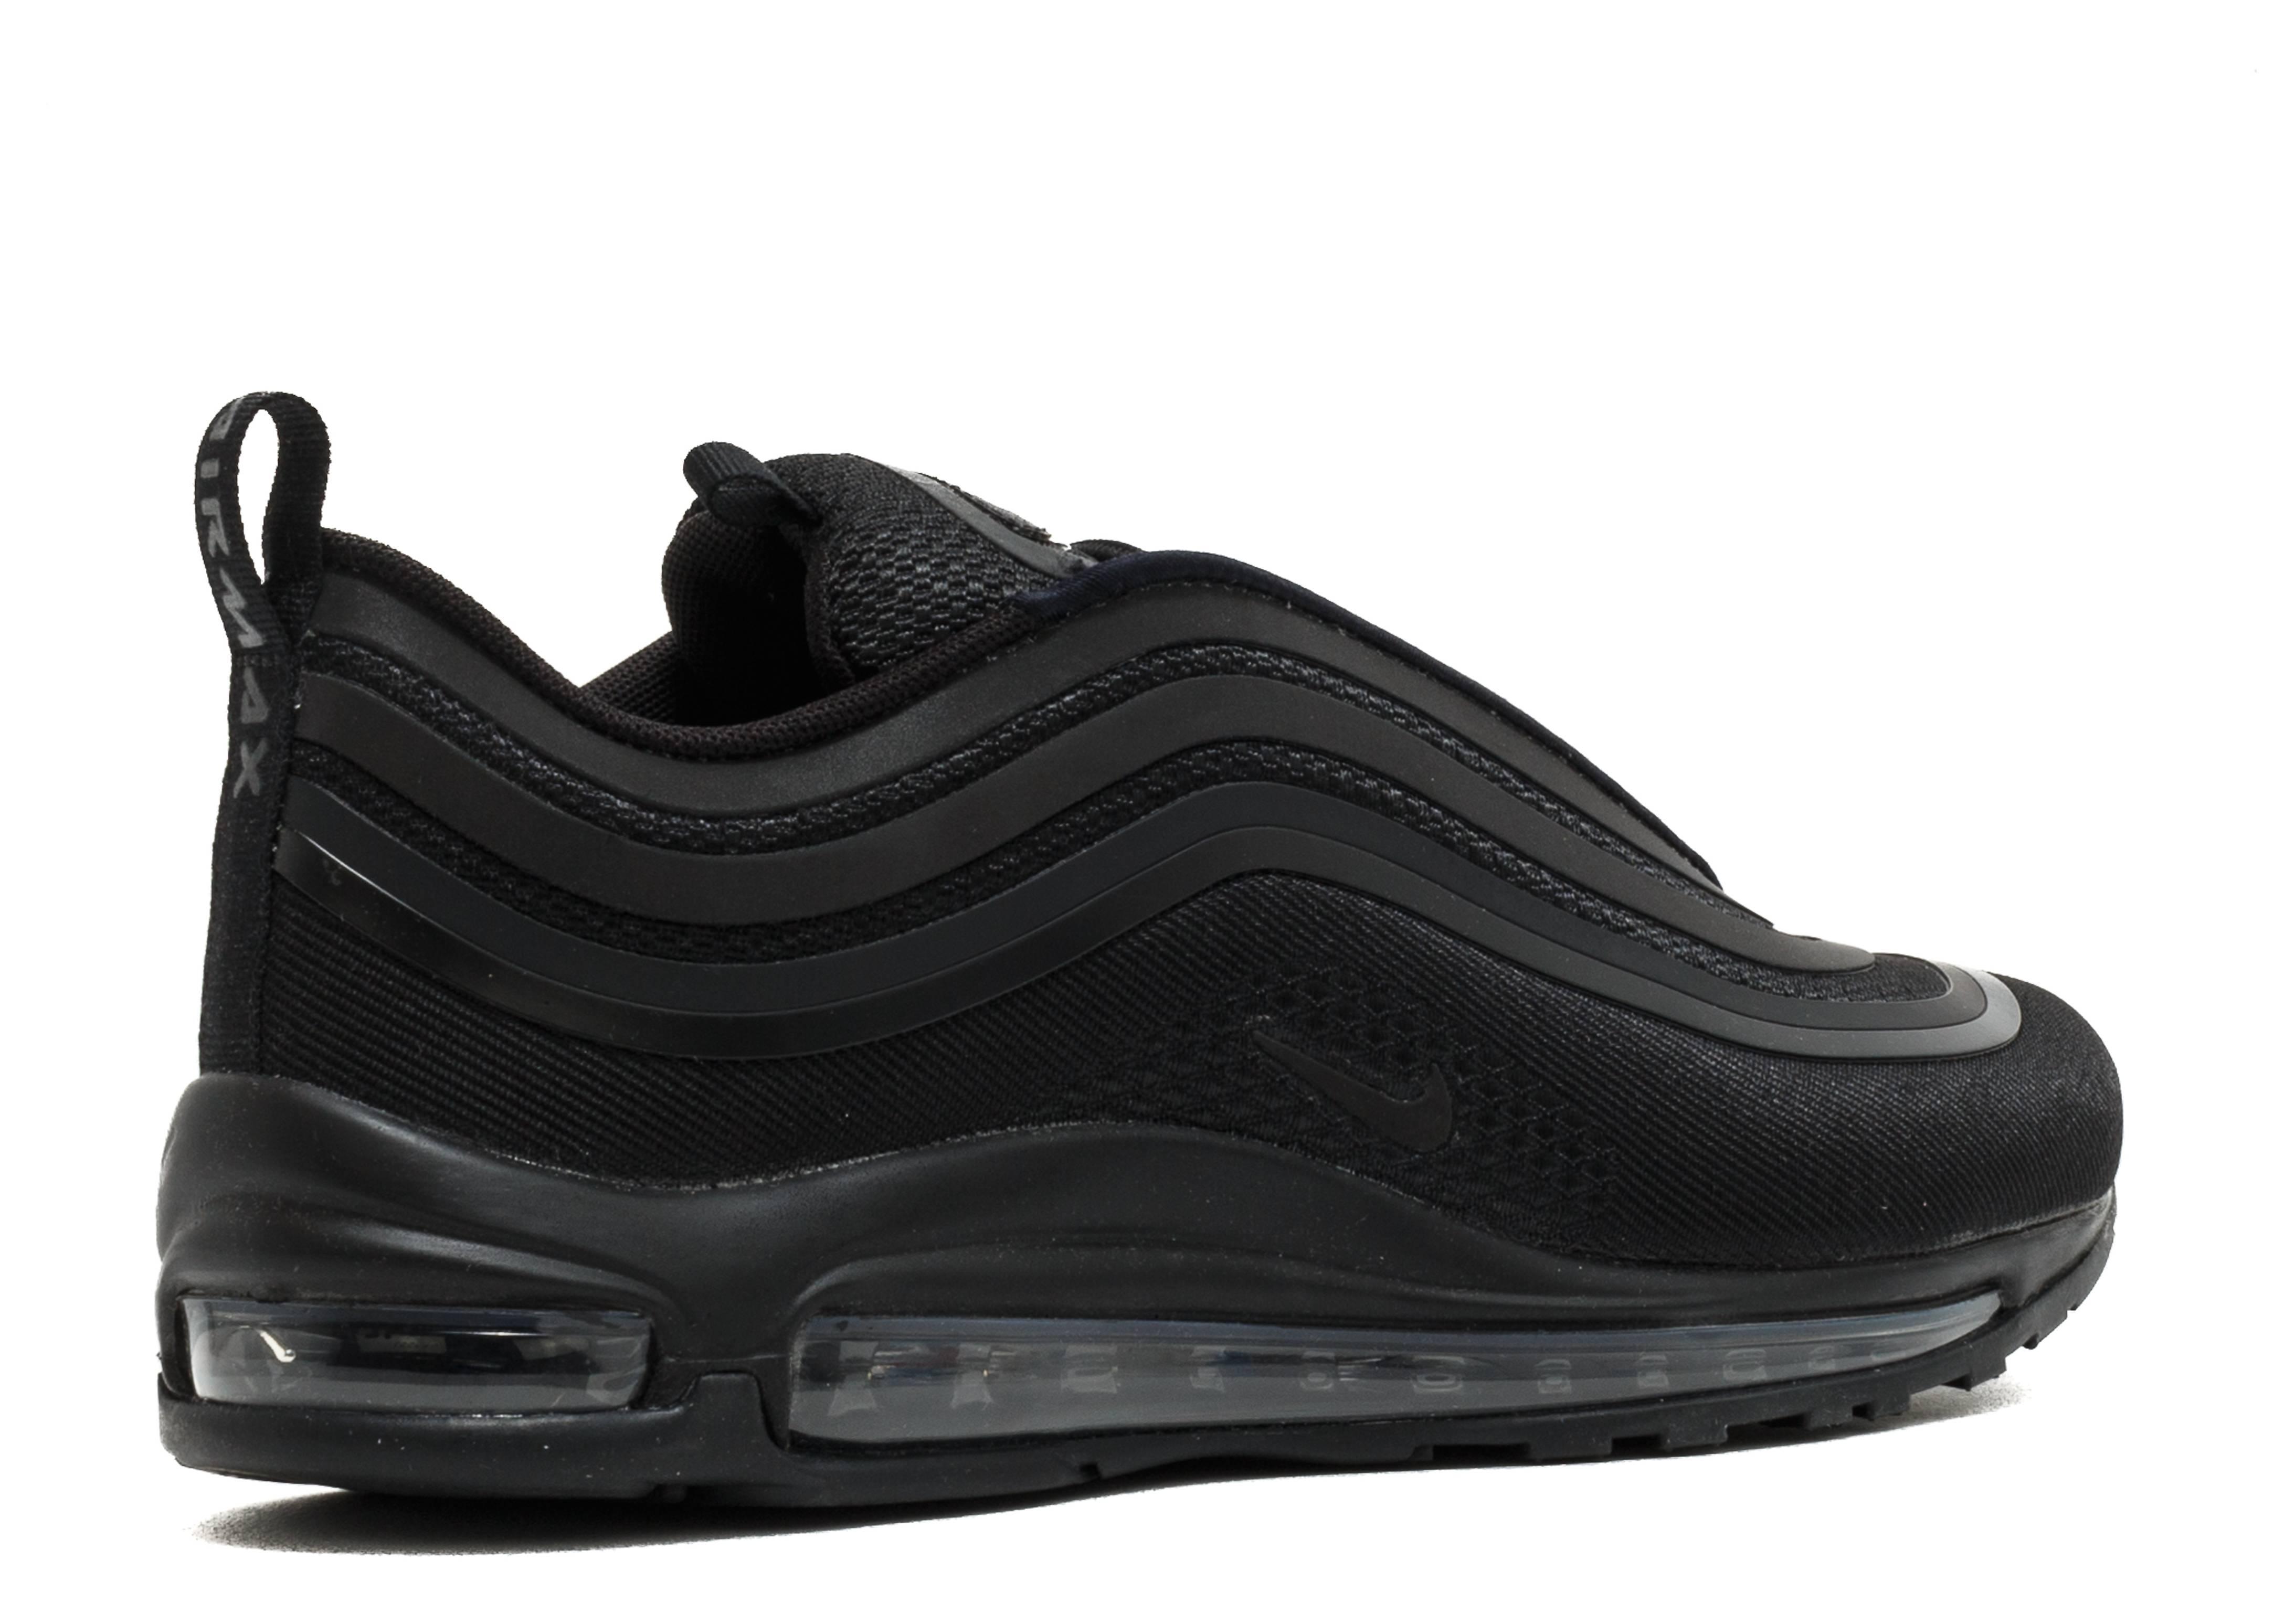 Air Max 97 Ultra 17 'Triple Black' - Nike - 918356 002 - black ...